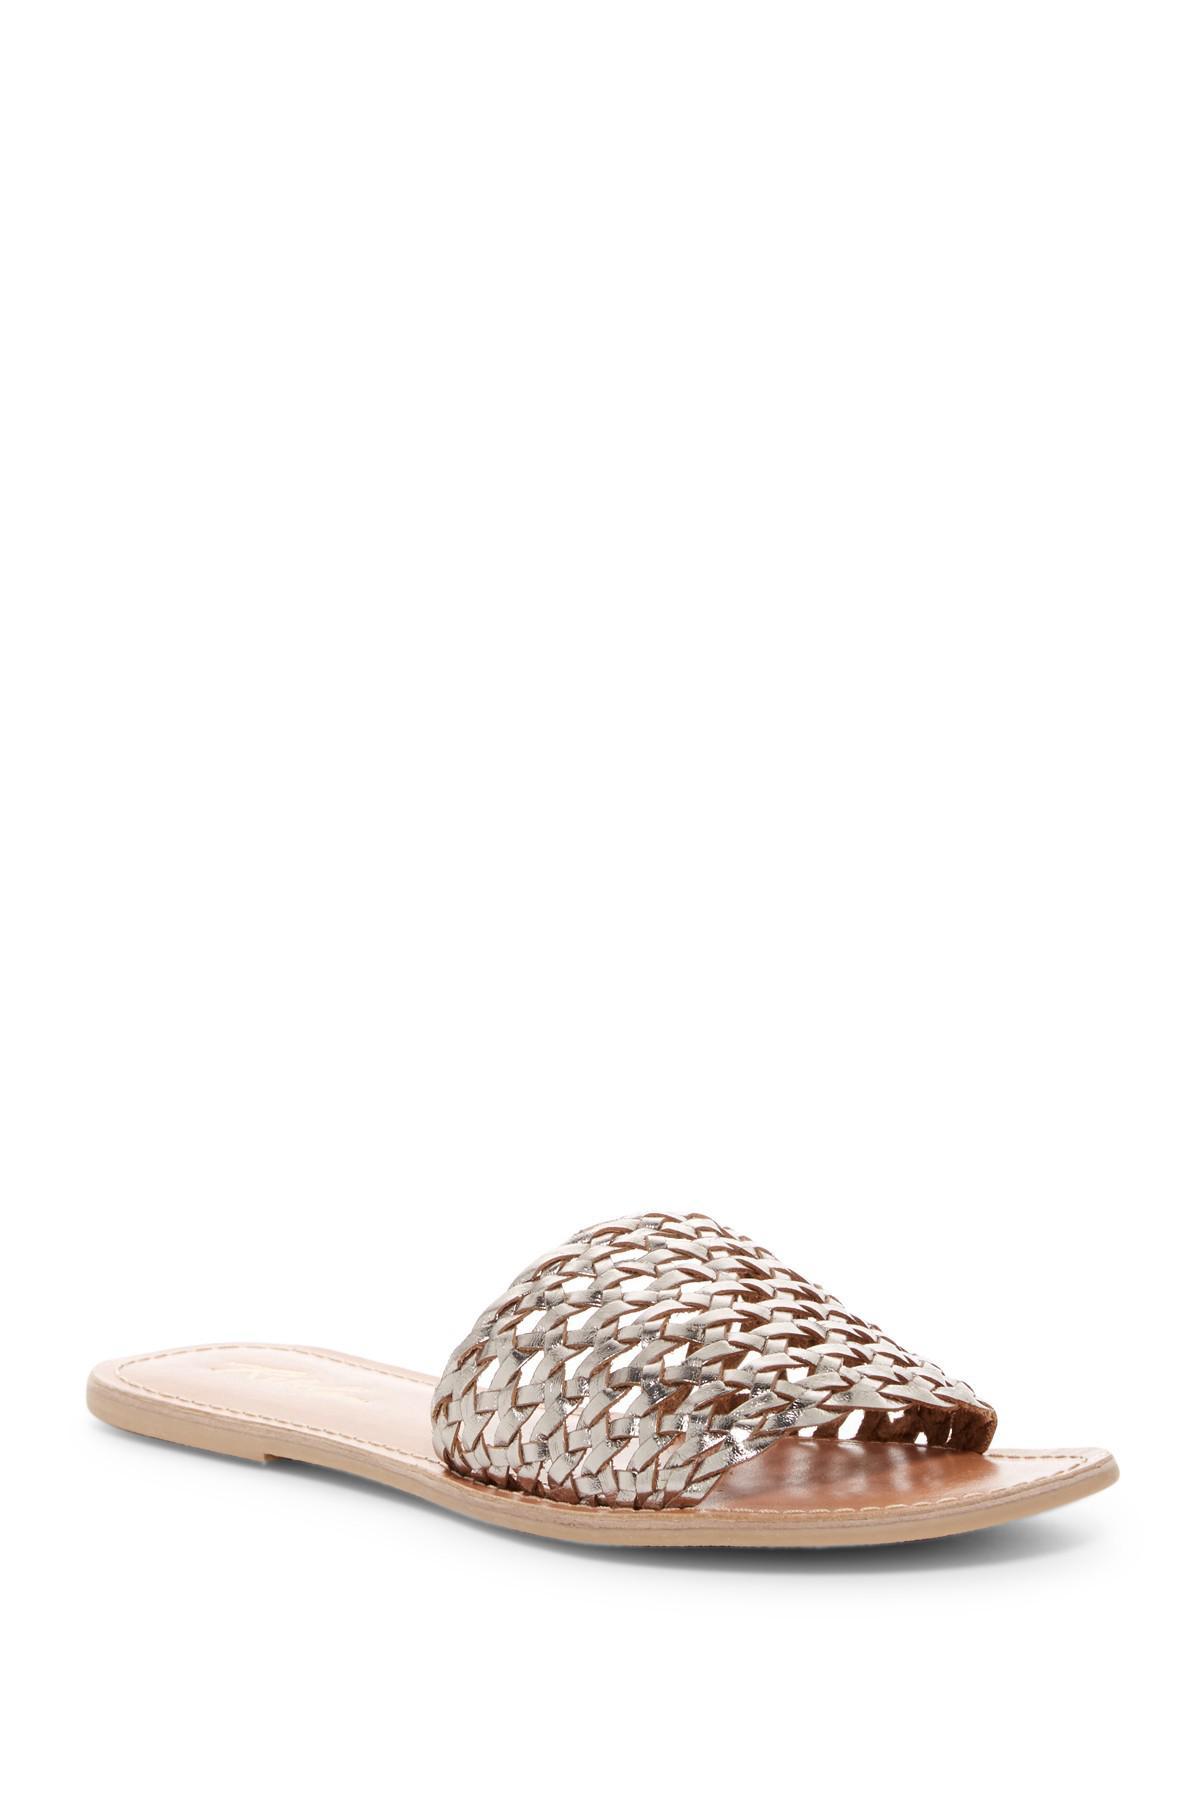 175794e98518 Lyst - Rebels Bettina Leather Lattice Slide Sandal